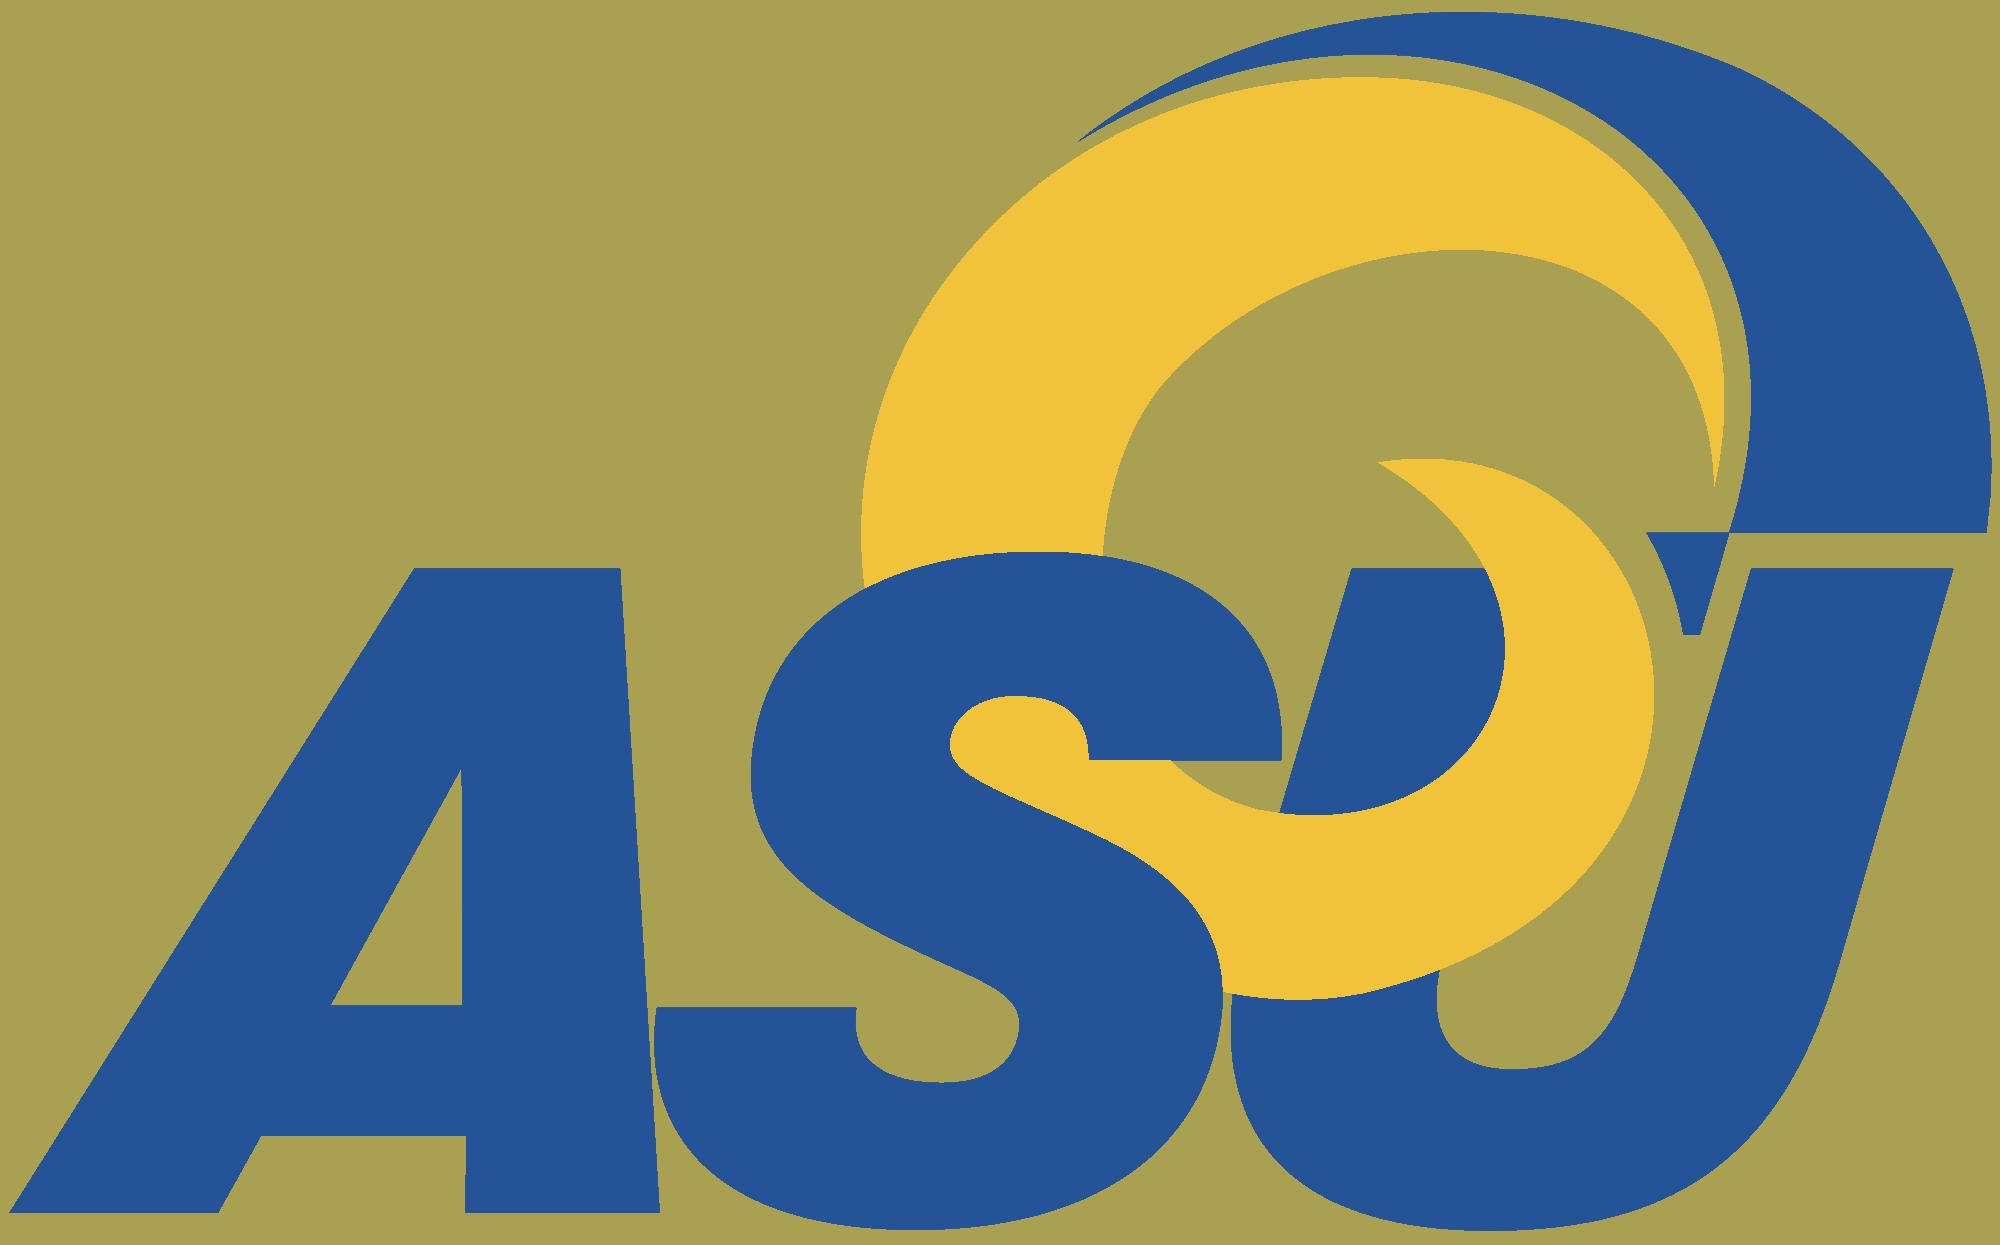 angelo state university logo 5123